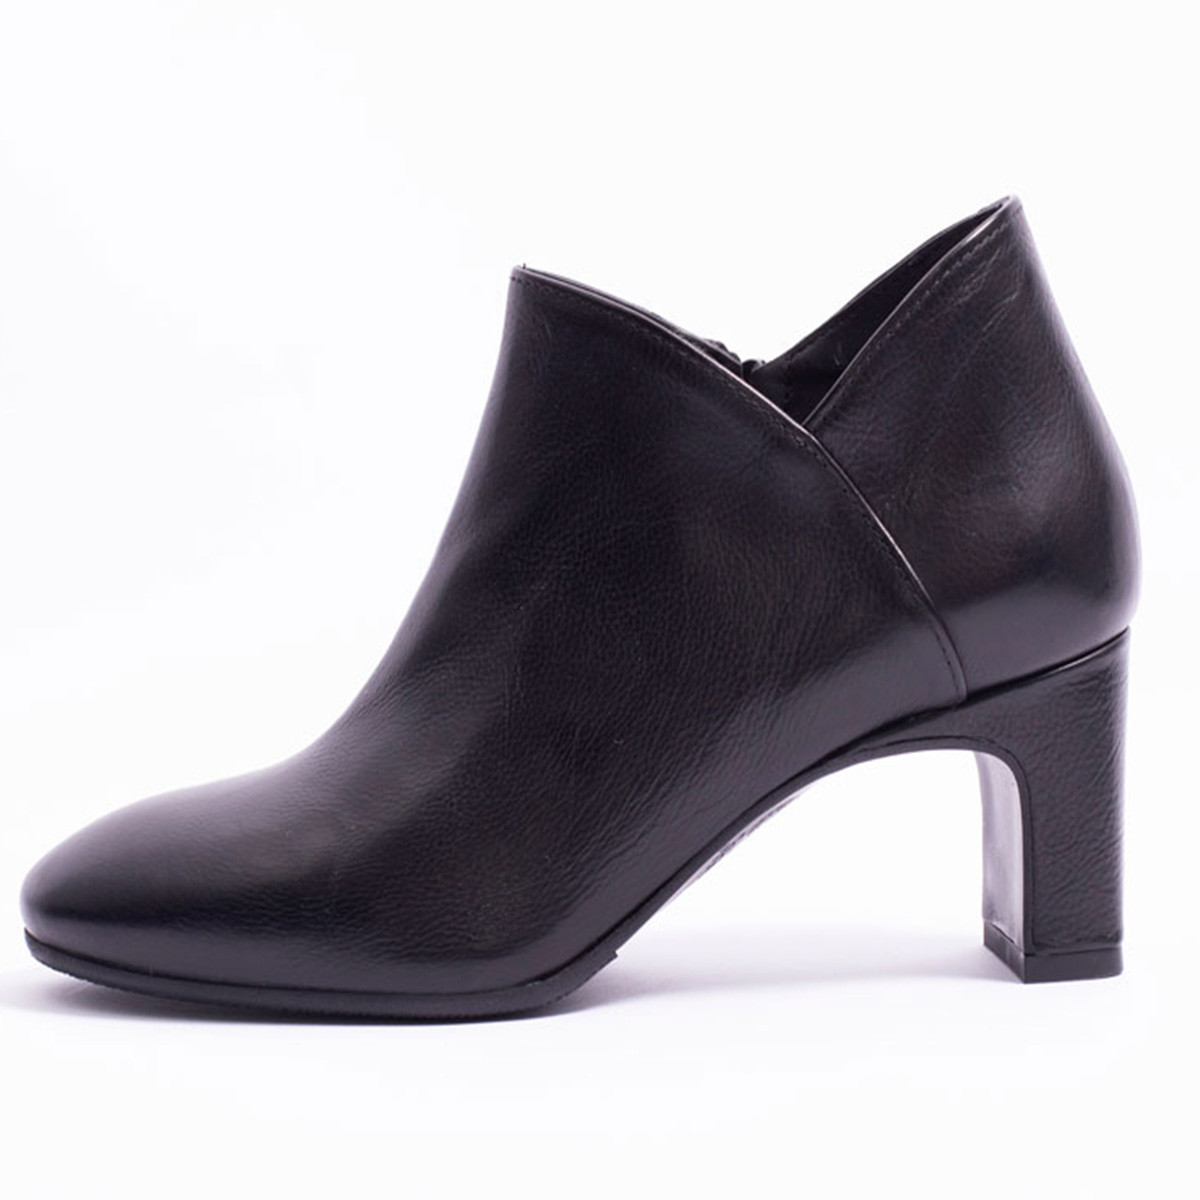 Mi-Boots cuir noir